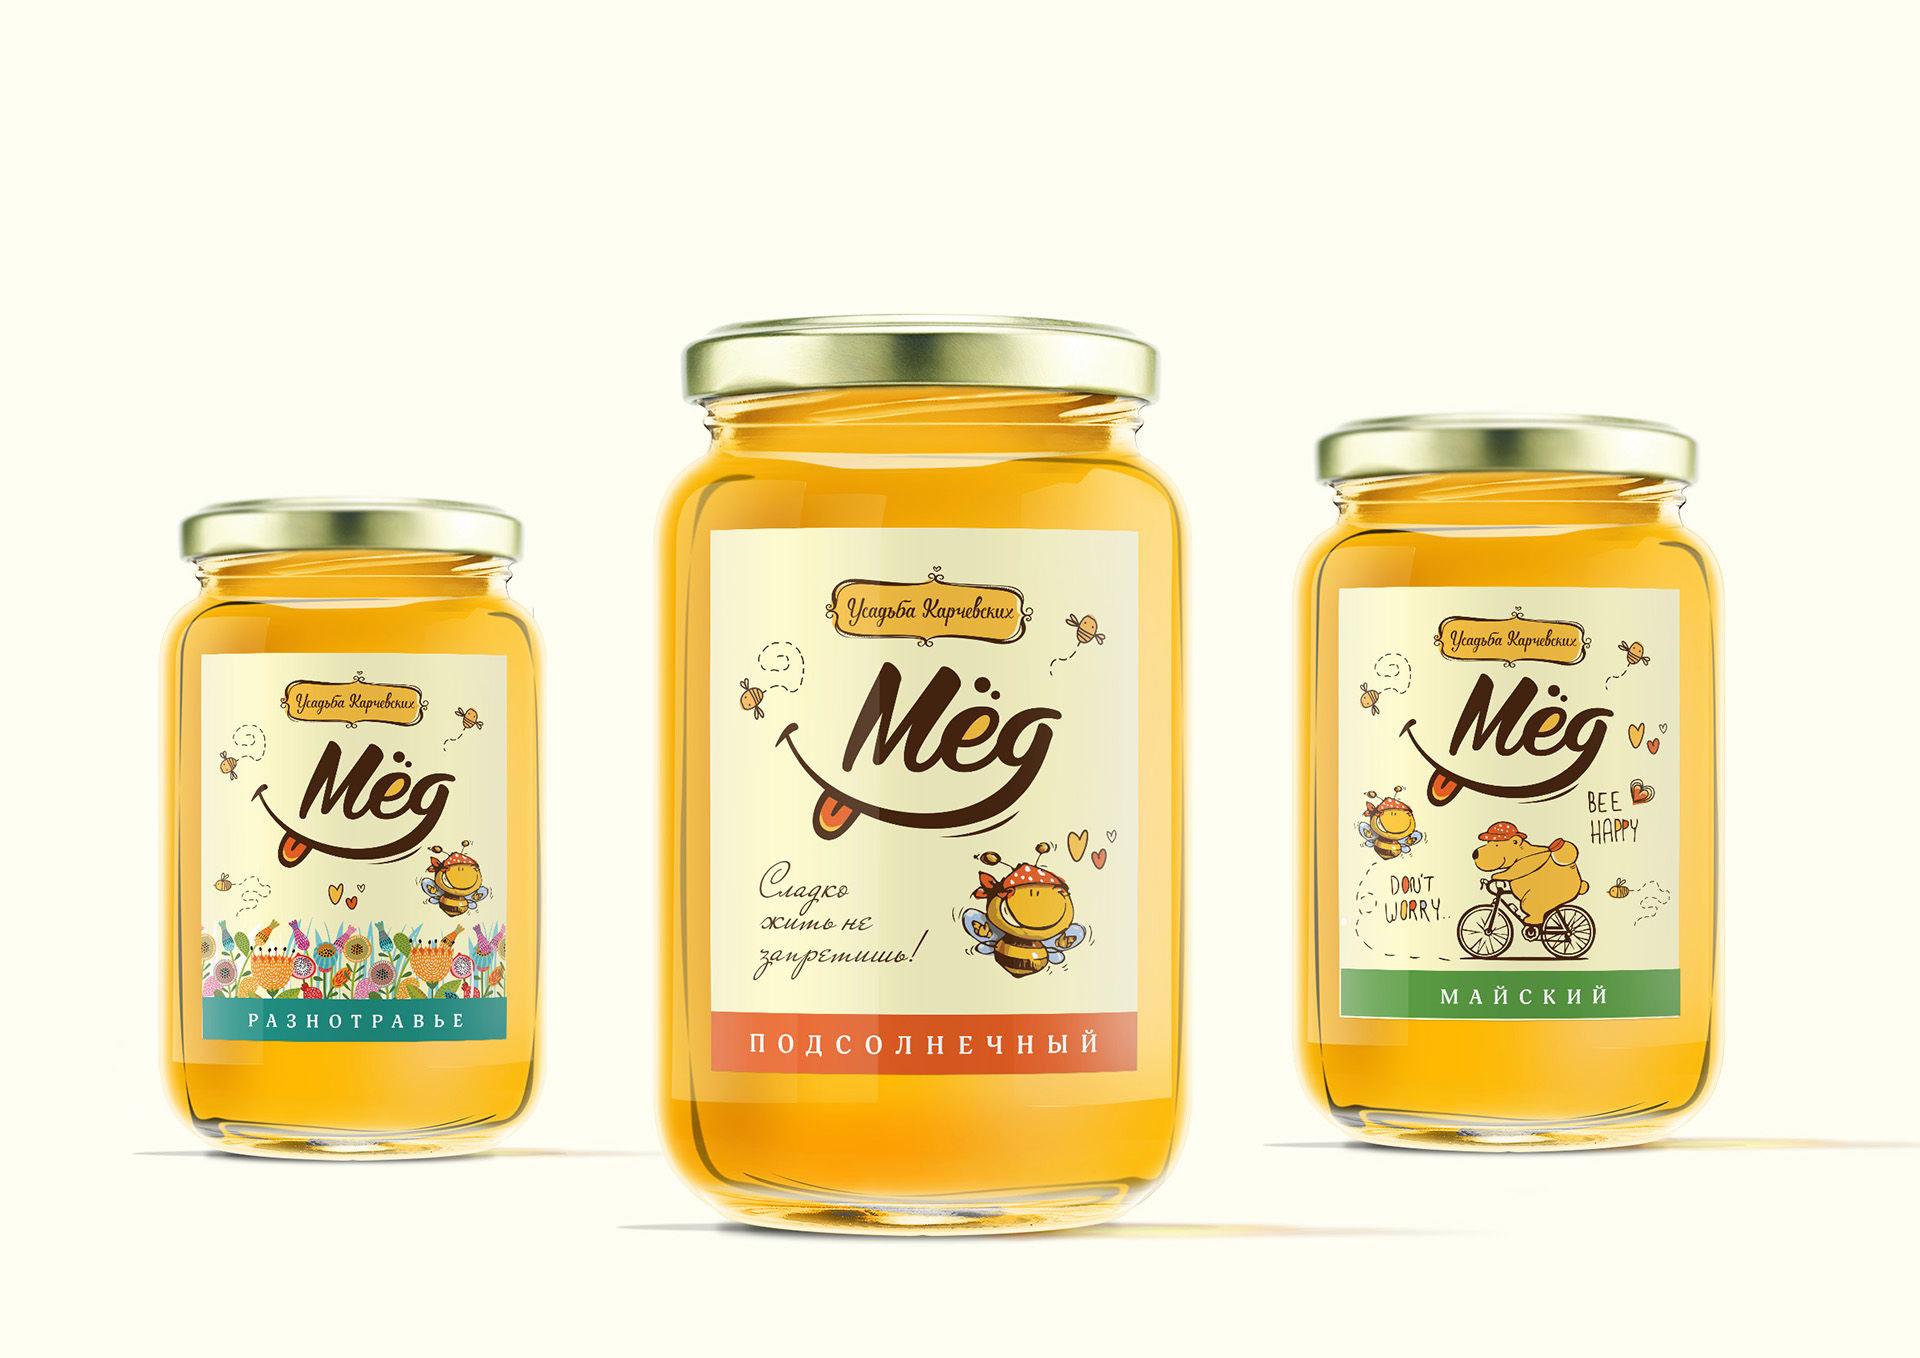 development этикетки and упаковки для меда